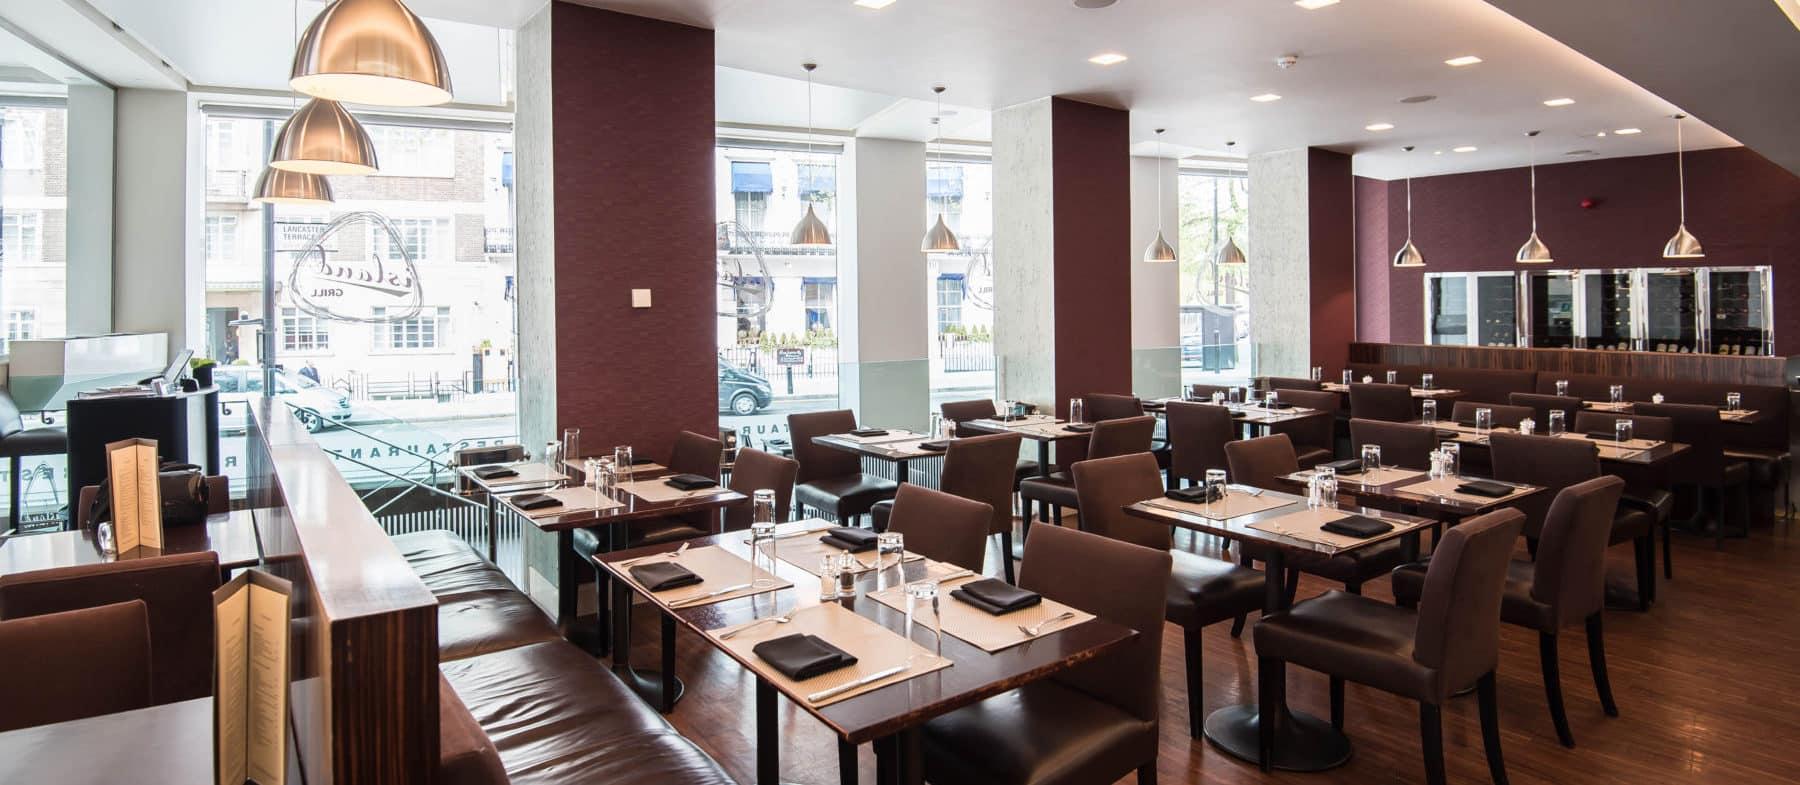 Hotel Restaurants in London